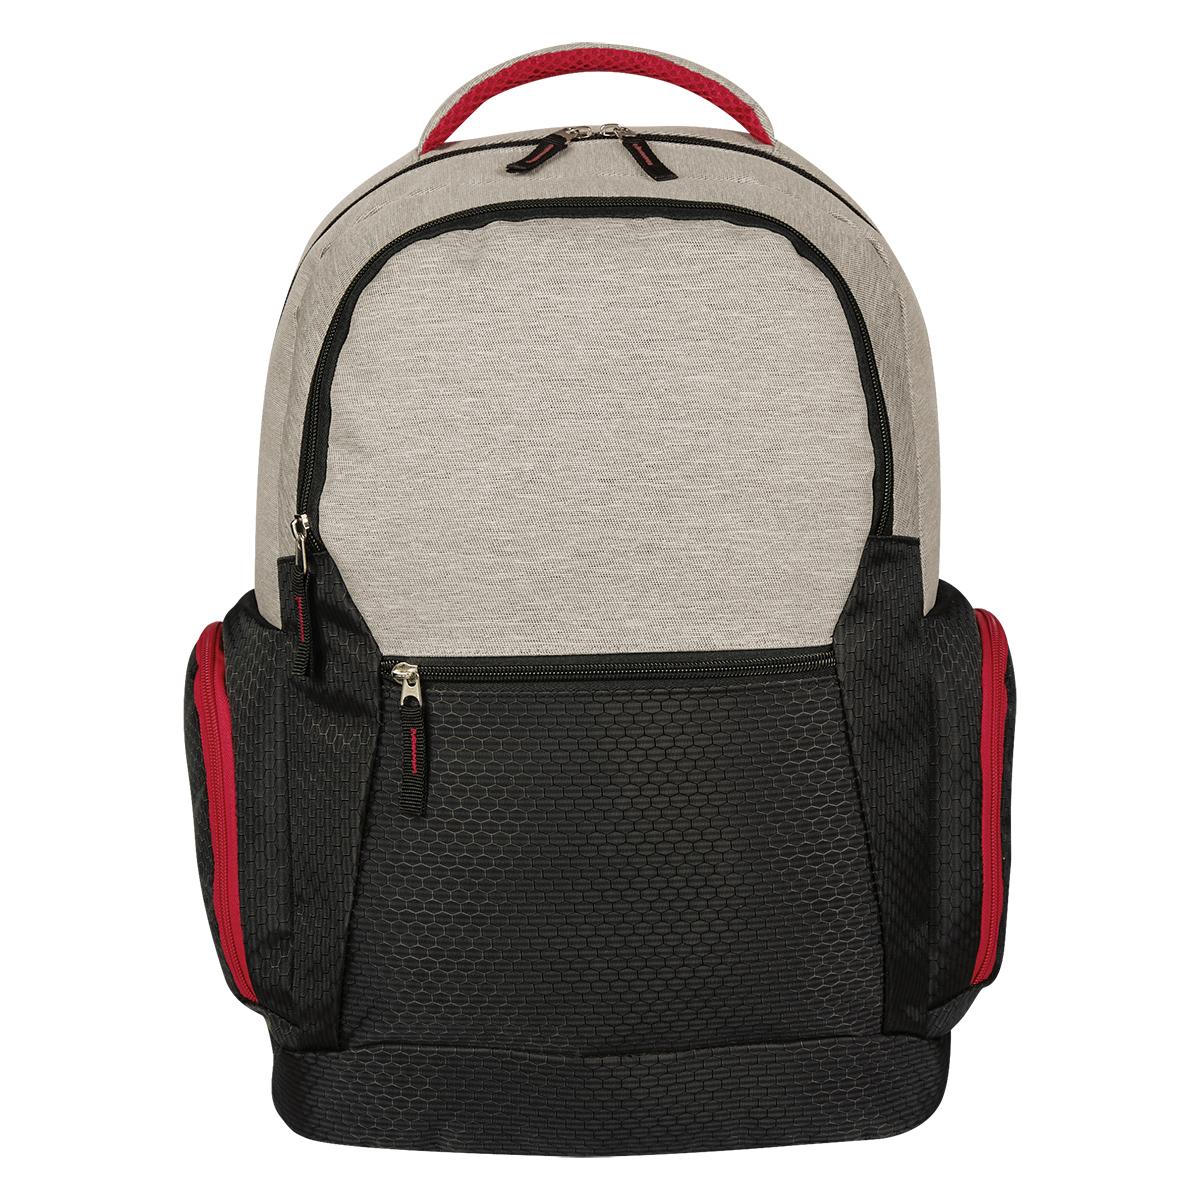 3411 - Backpack porta laptop Urban